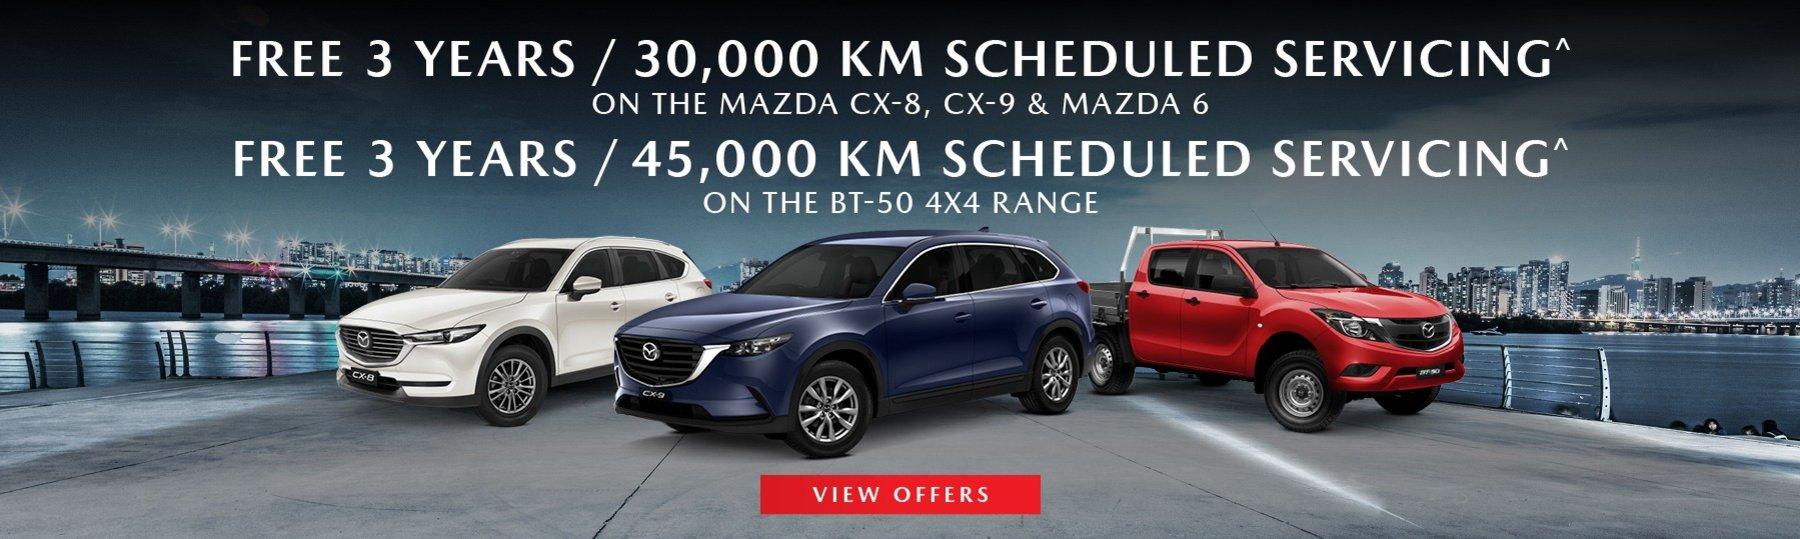 Macarthur Mazda Servicing Special Offer